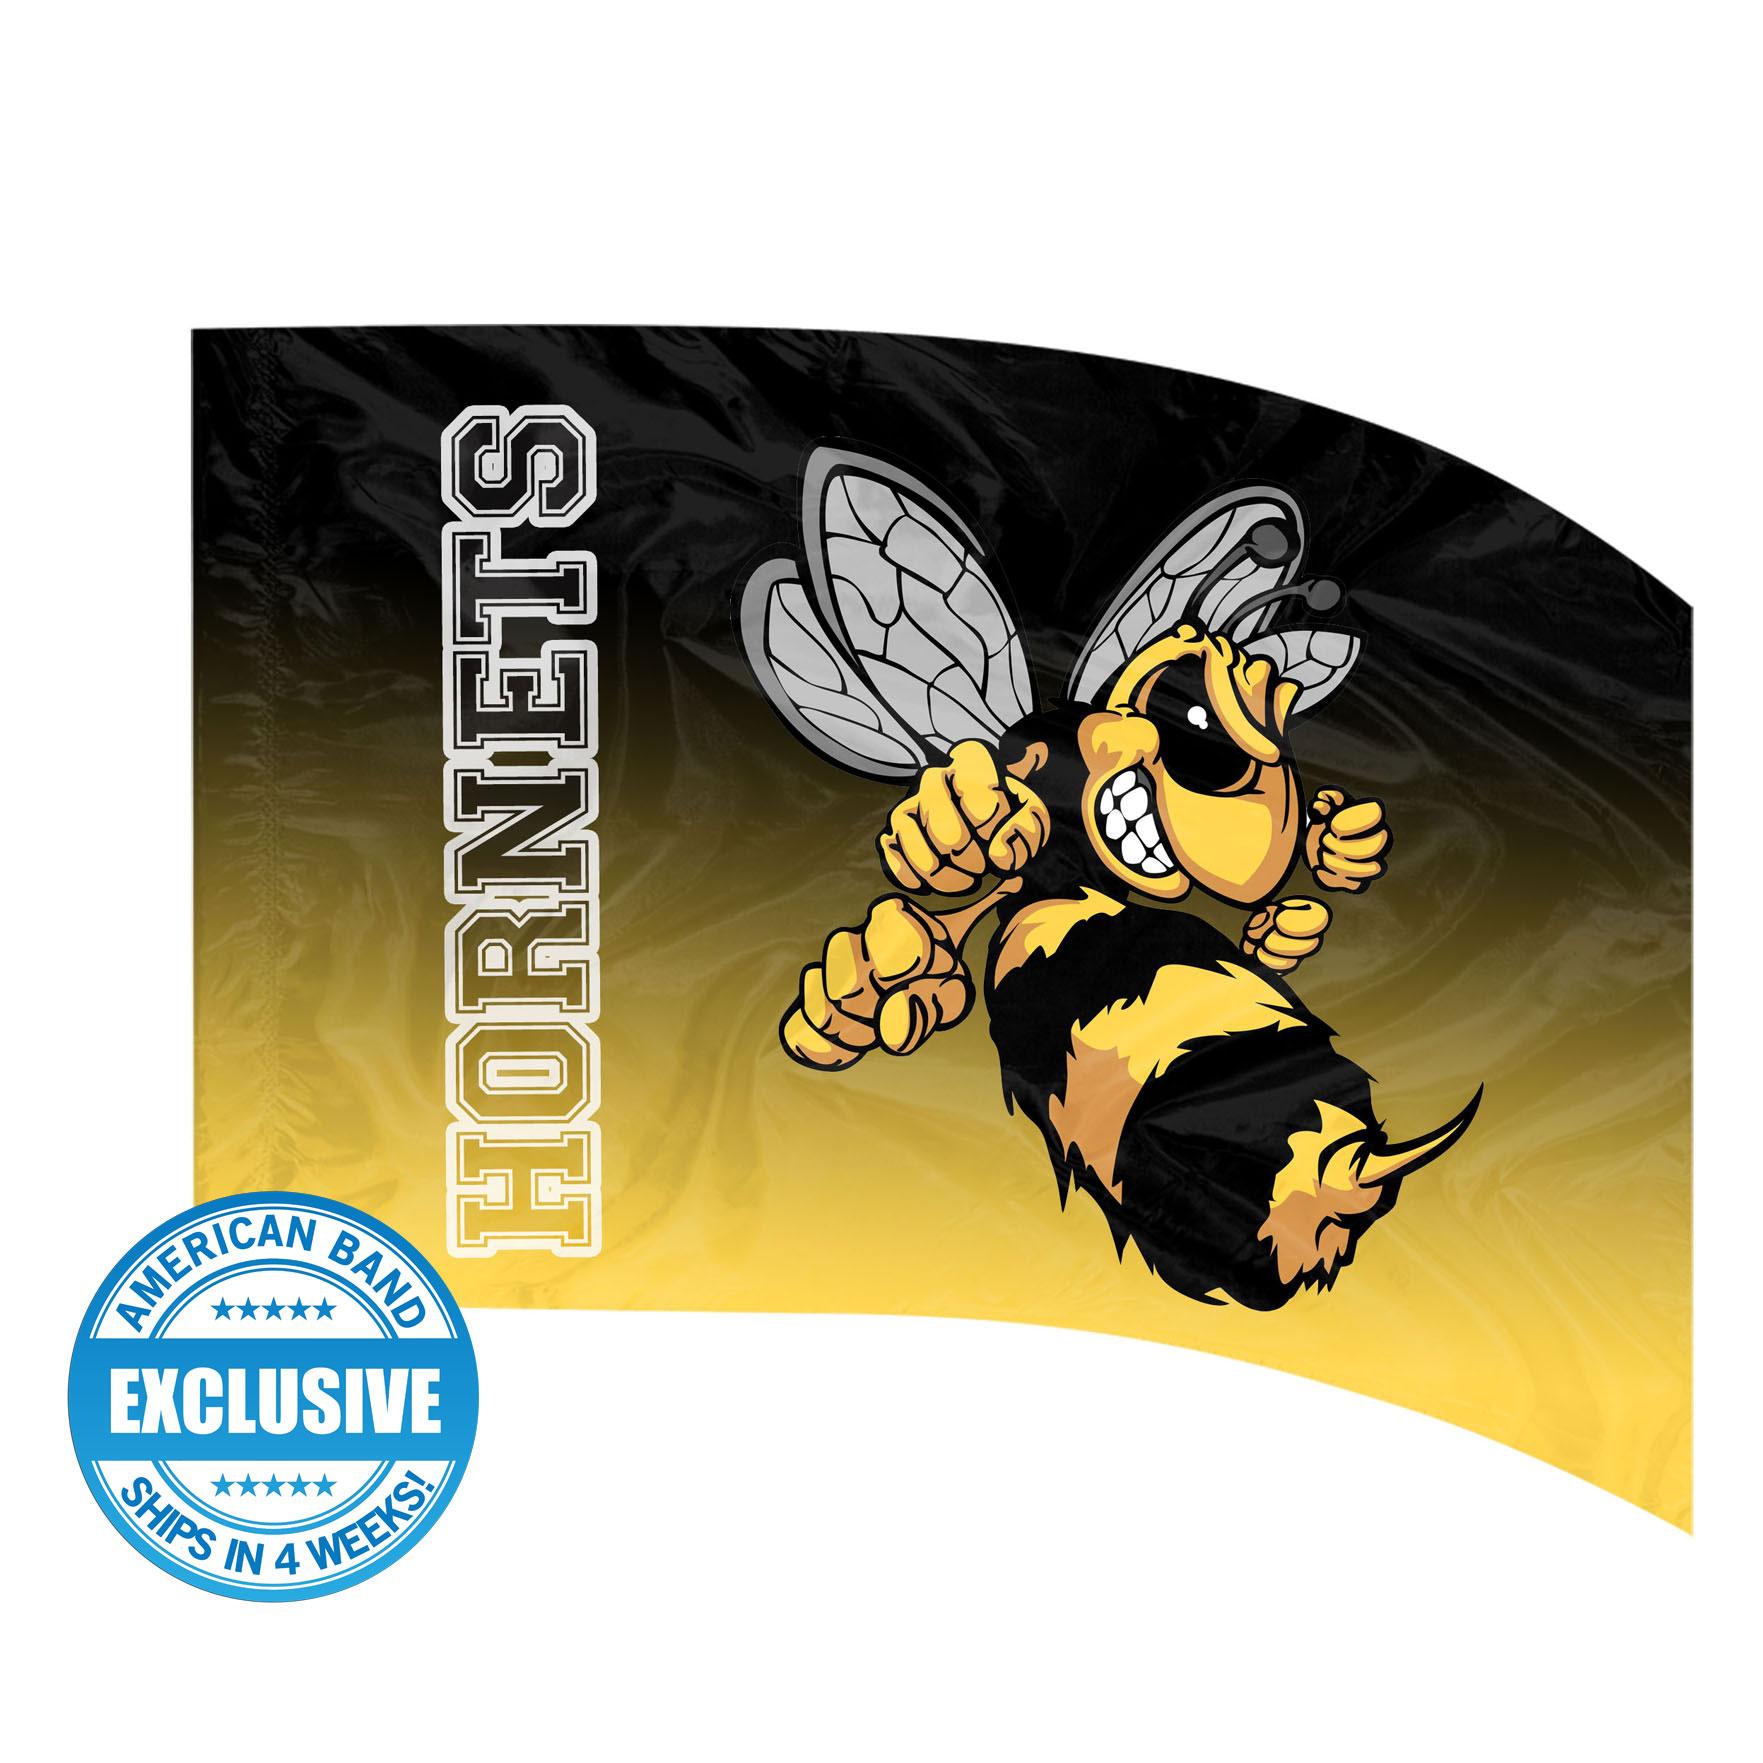 Made-to-Order Digital Mascot Flags - Hornet